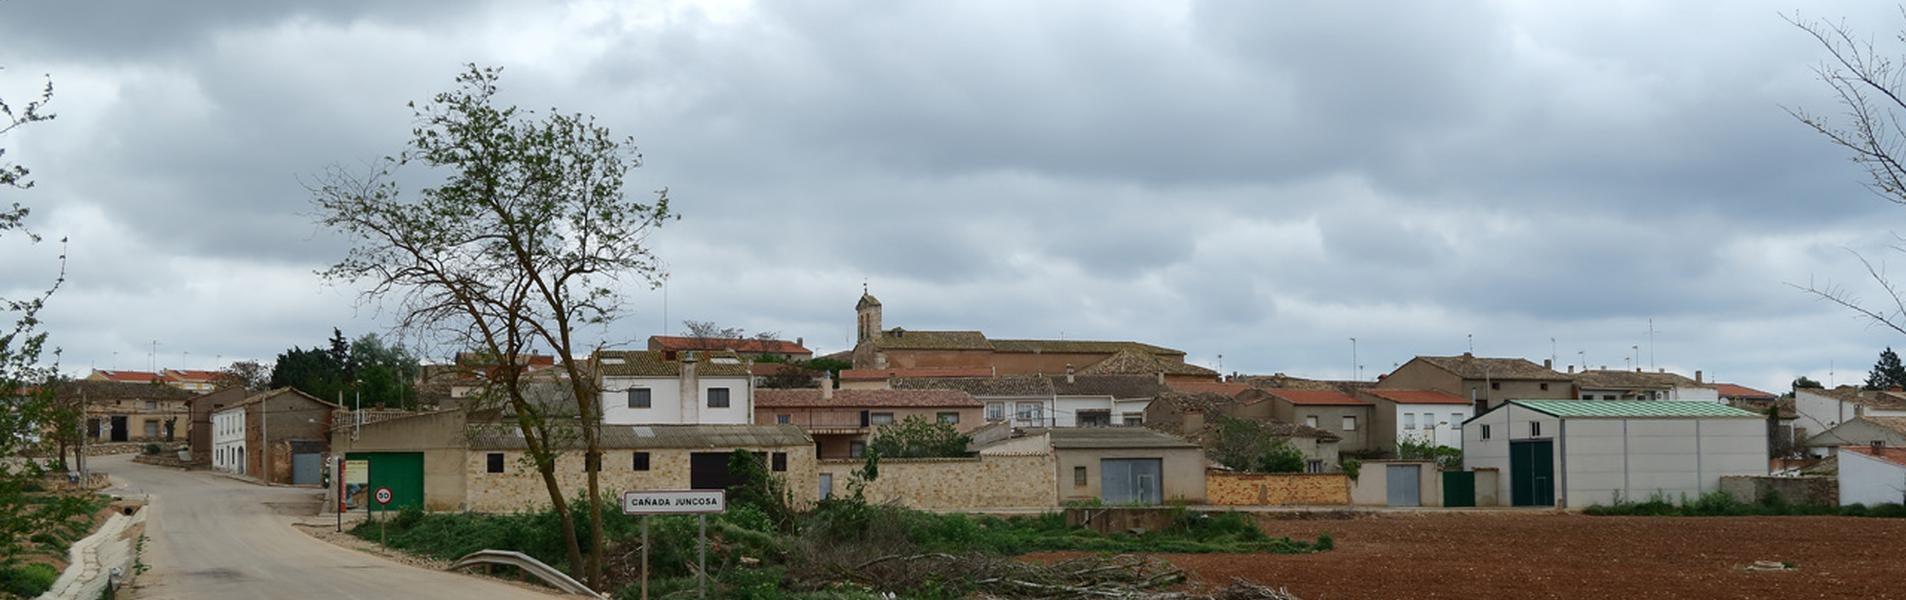 Cañada Juncosa